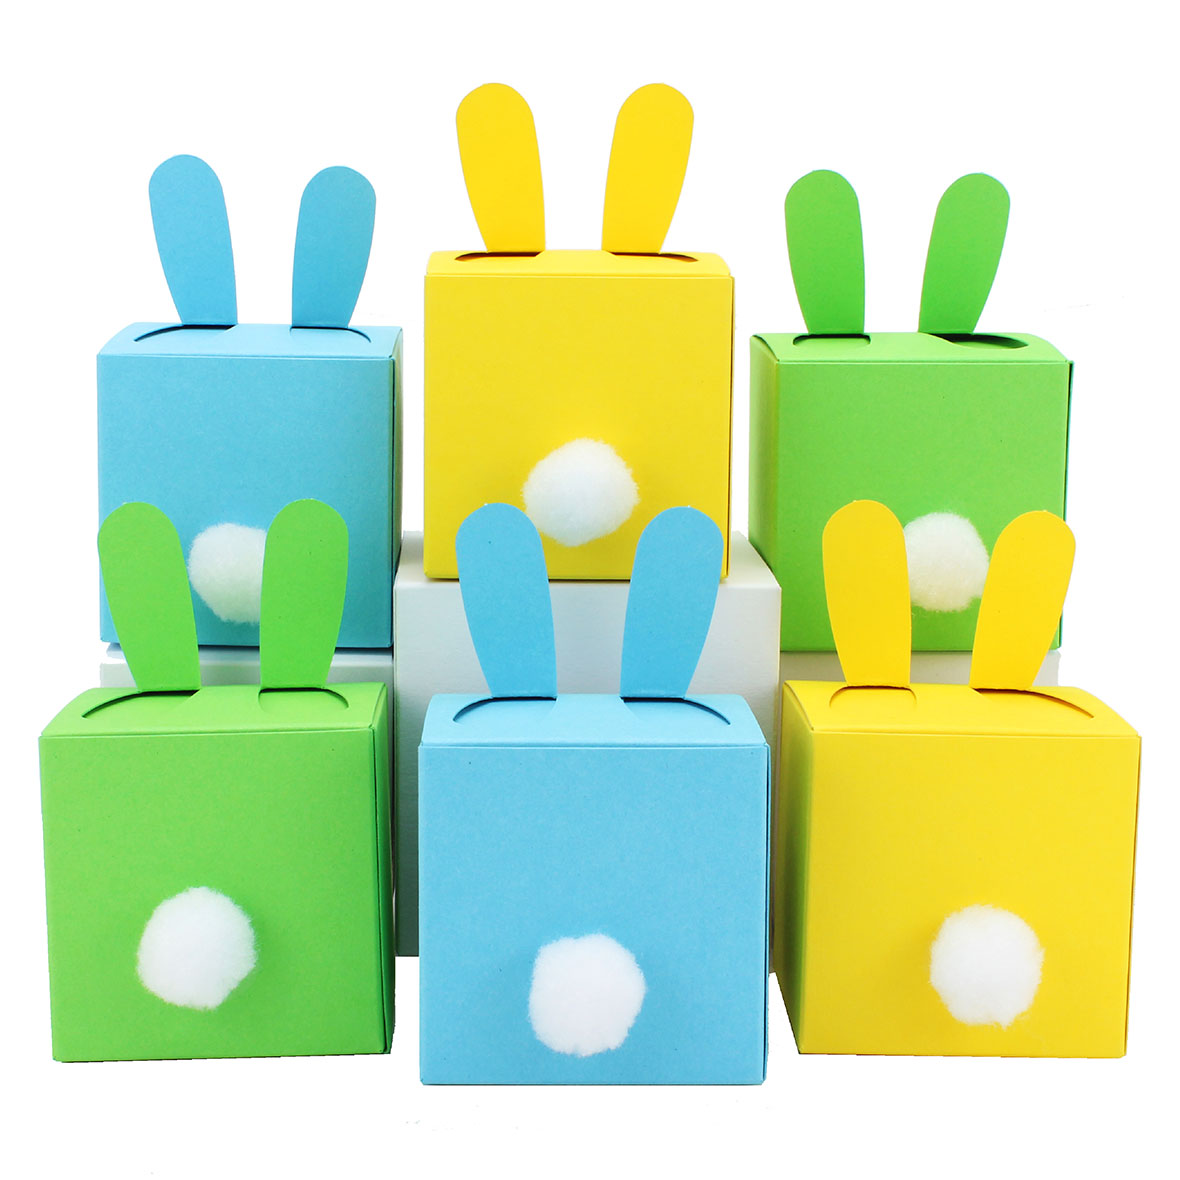 diy osterhasen kisten zum selber bef llen 6 blaue boxen i schachteln f r jungen papierdrachen. Black Bedroom Furniture Sets. Home Design Ideas